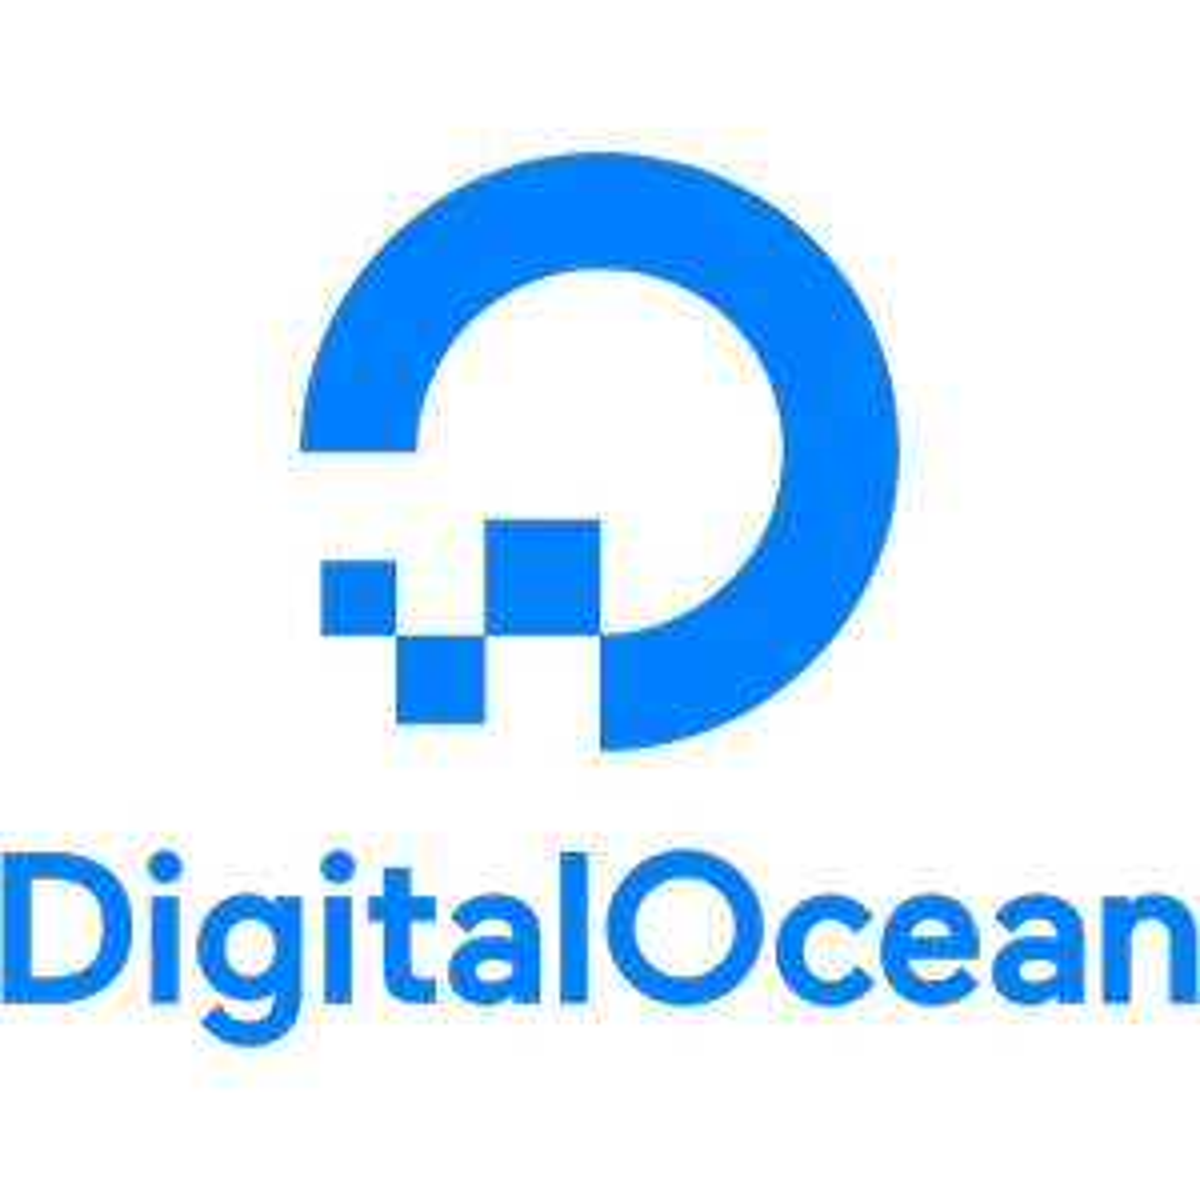 DigitalOcean $10/£7.17 free credit